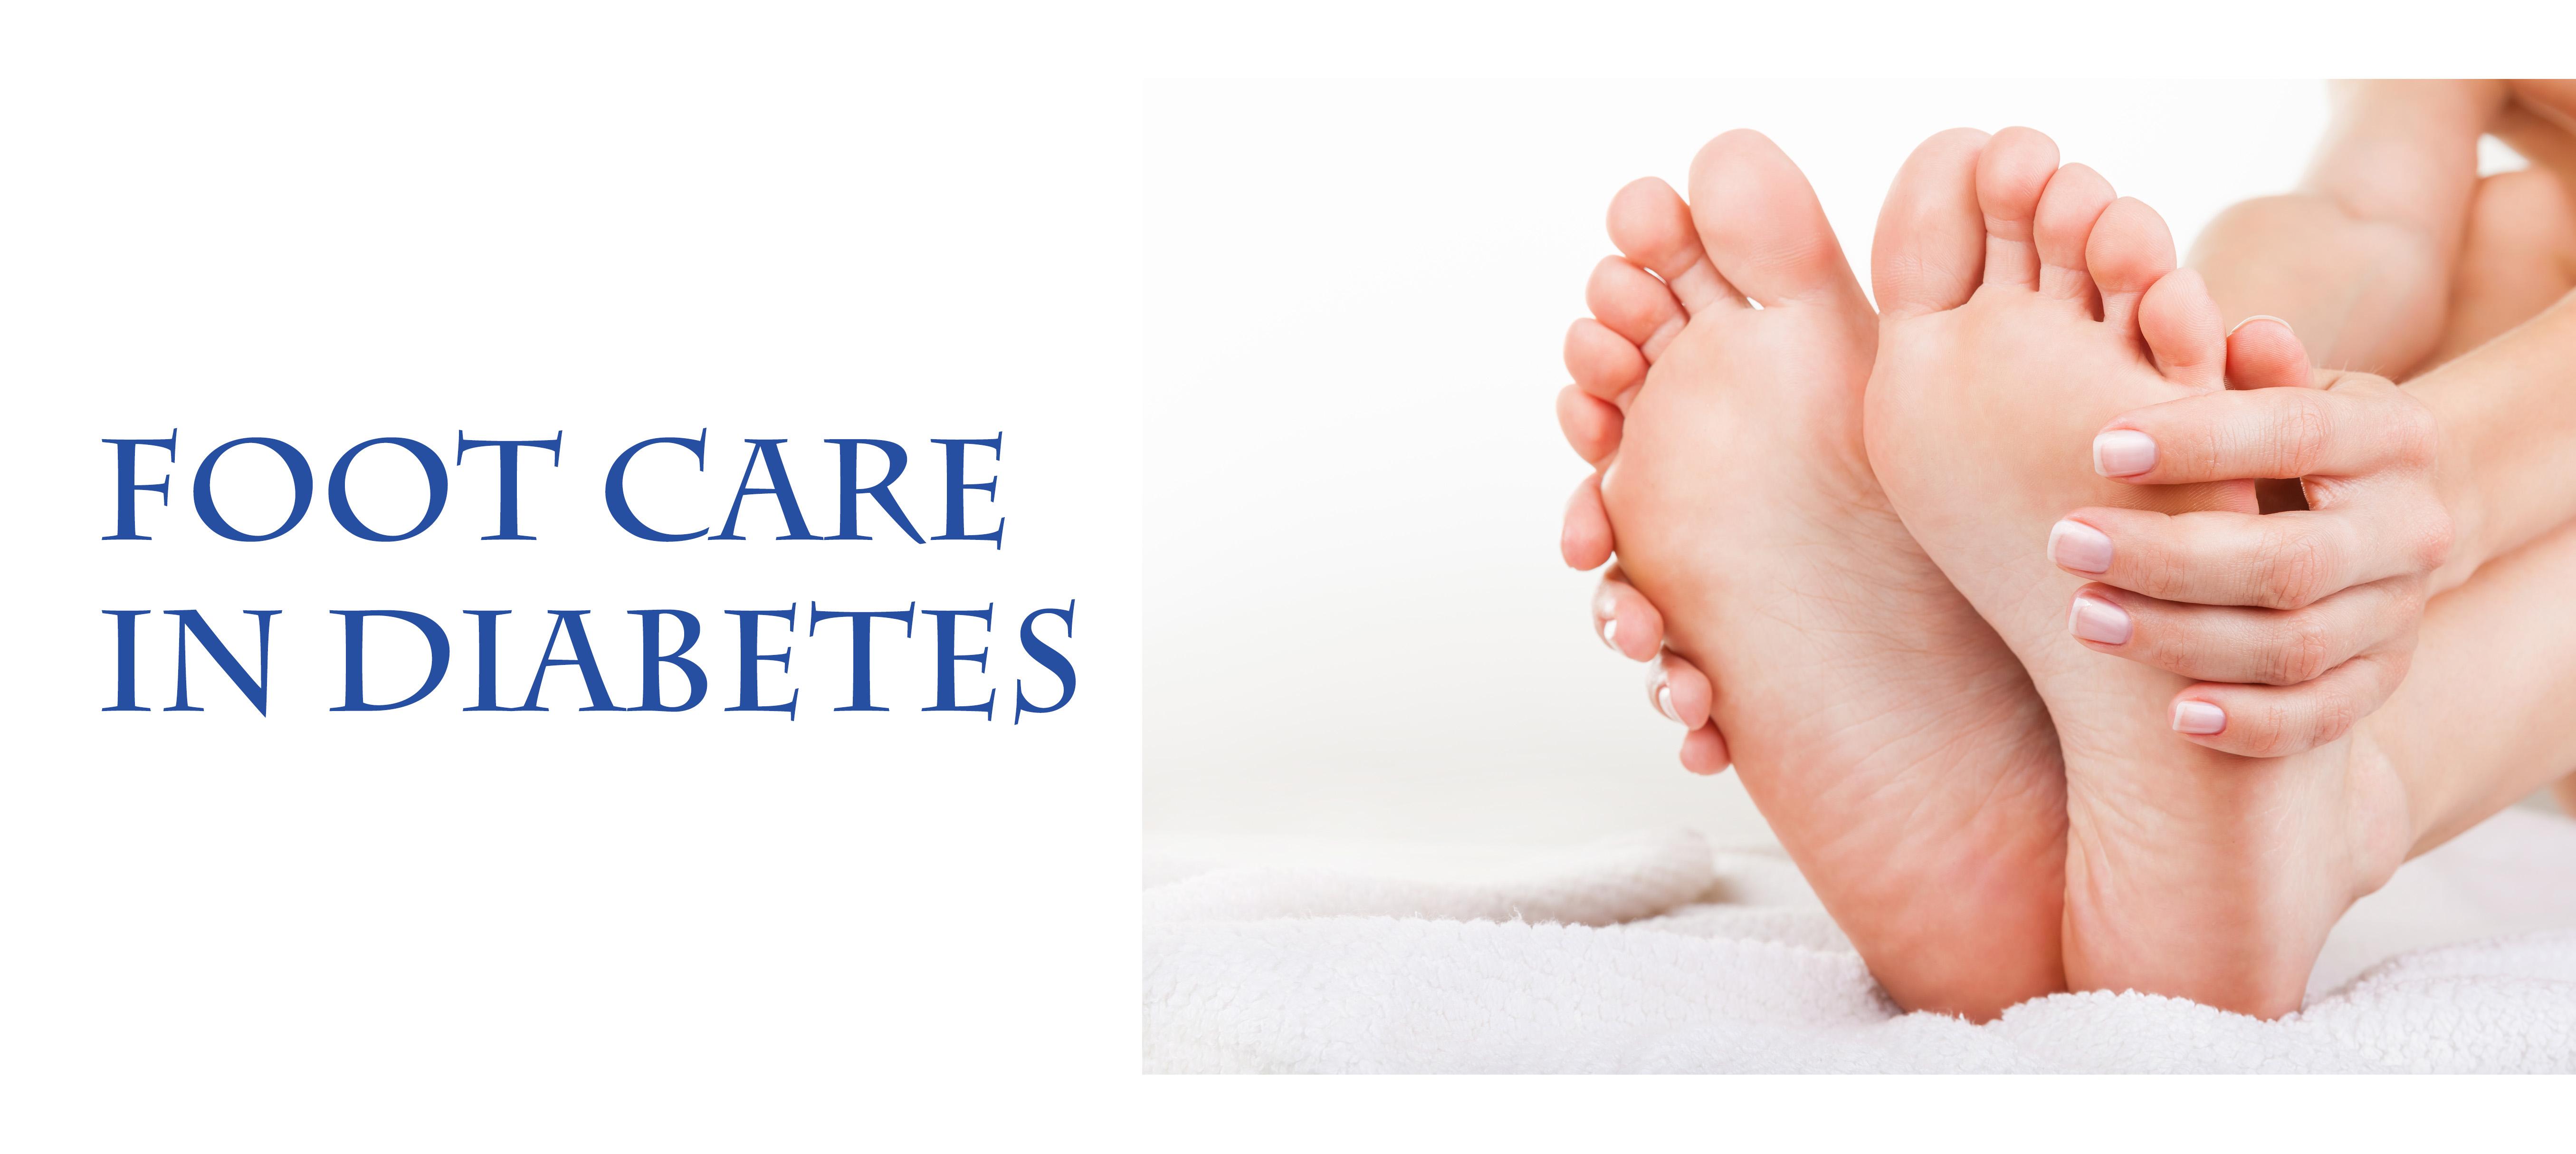 Foot Care in Diabetes